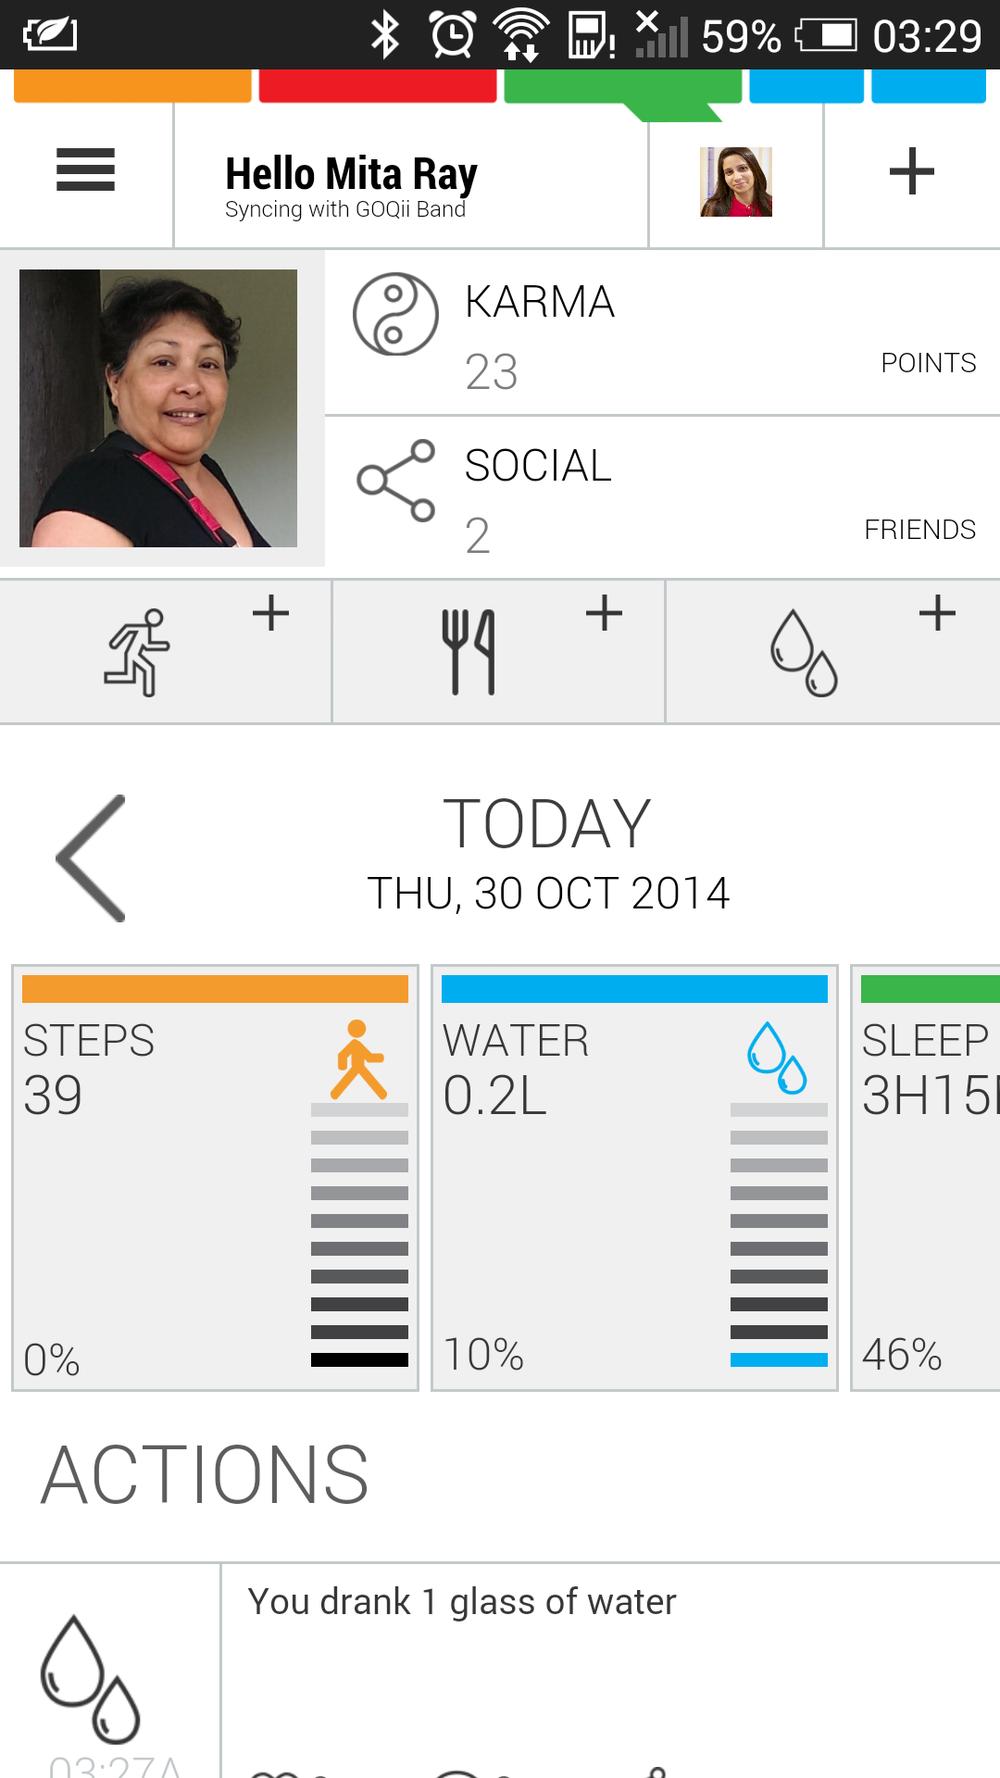 screenshot_2014-10-30-03-29-27.png